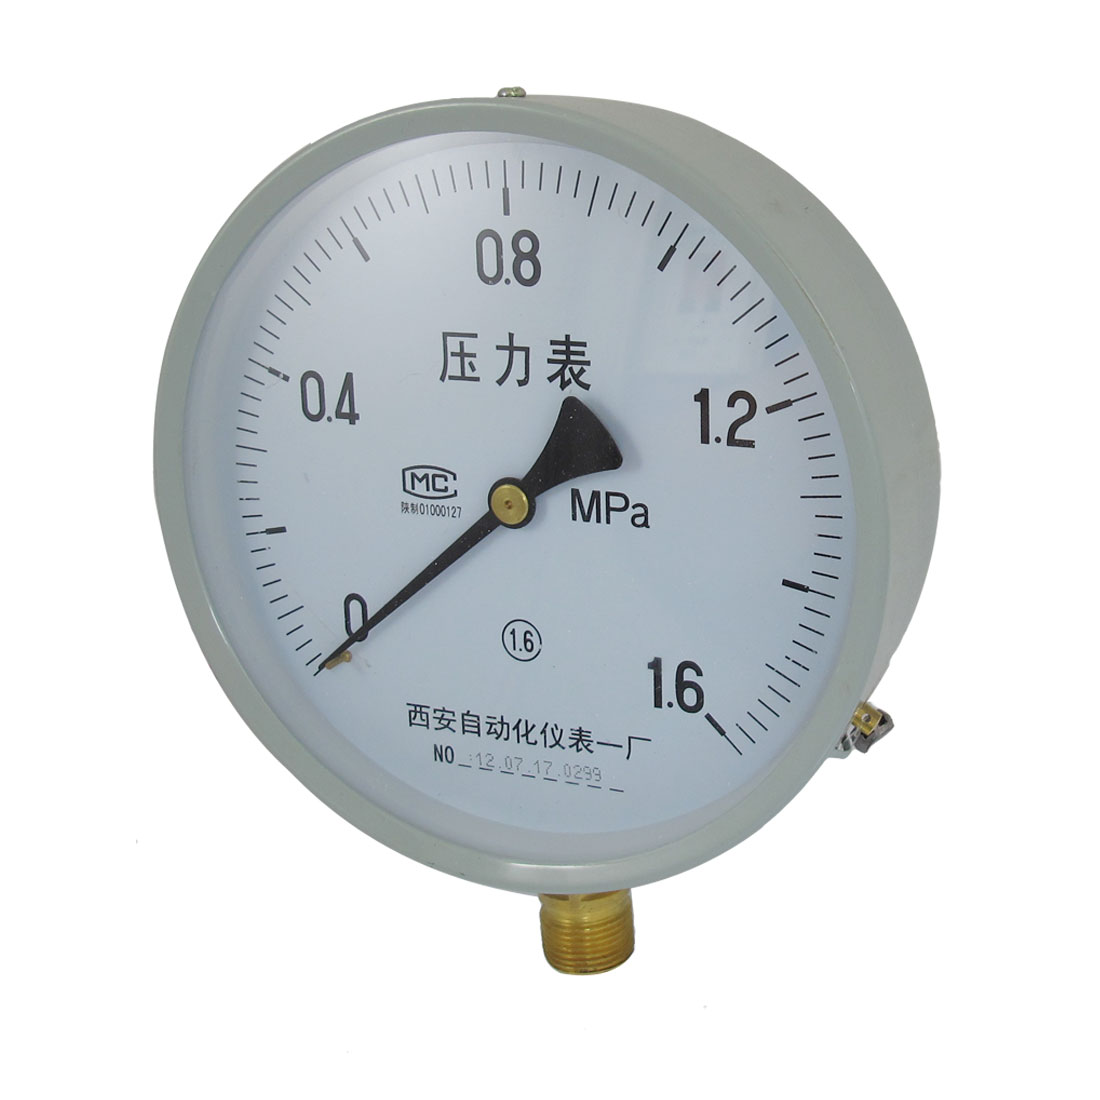 0-1.6Mpa 20mm Thread Horizontal Mount Pipeline Pressure Gauge Y-150